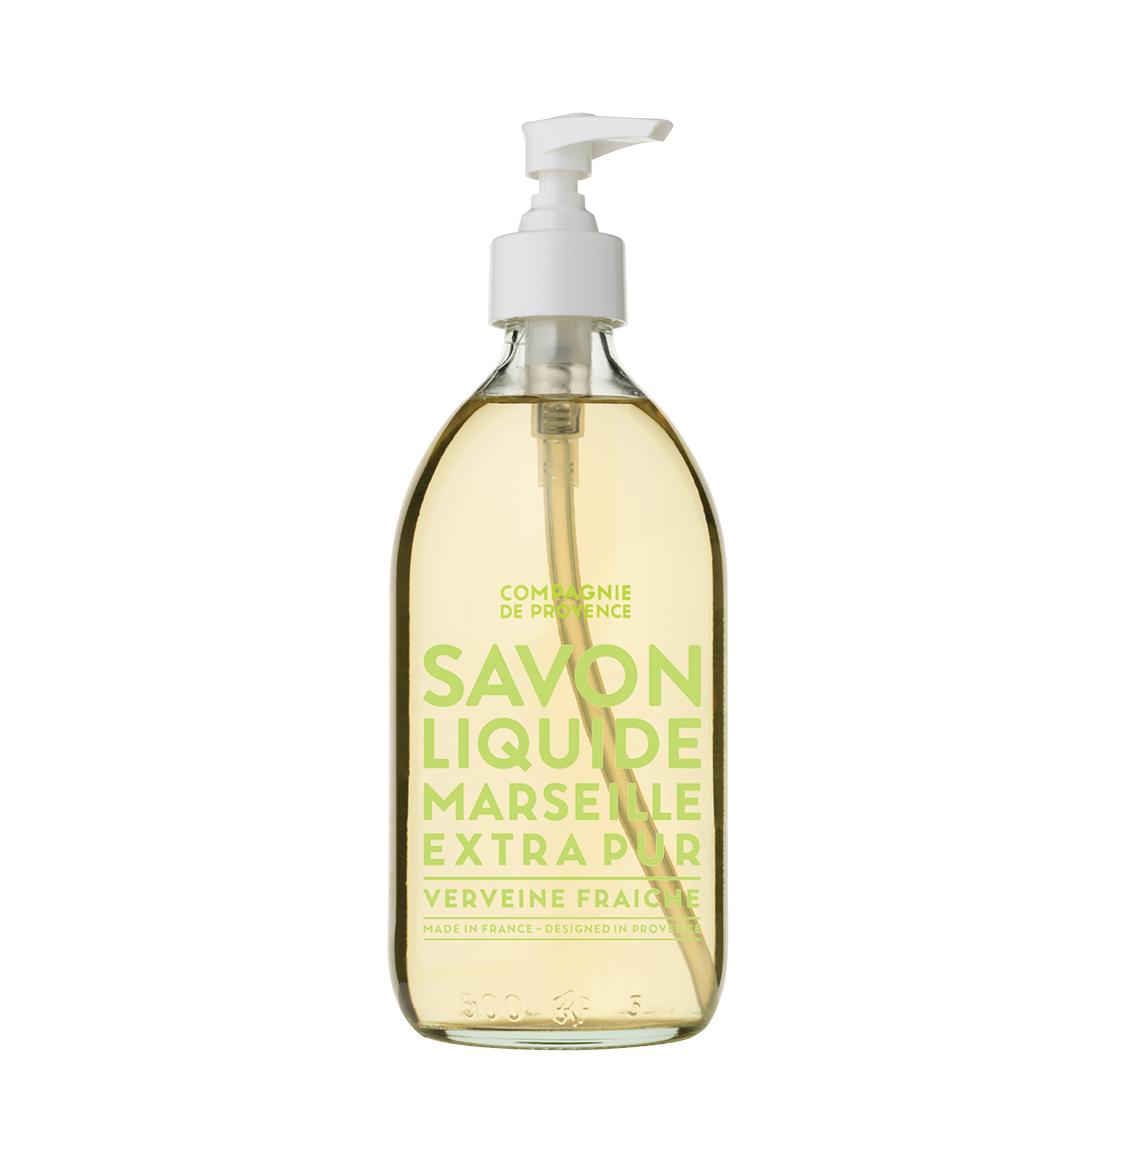 Compagnie De Provence Fresh Verbena Liquid Marseille Soap 500ml